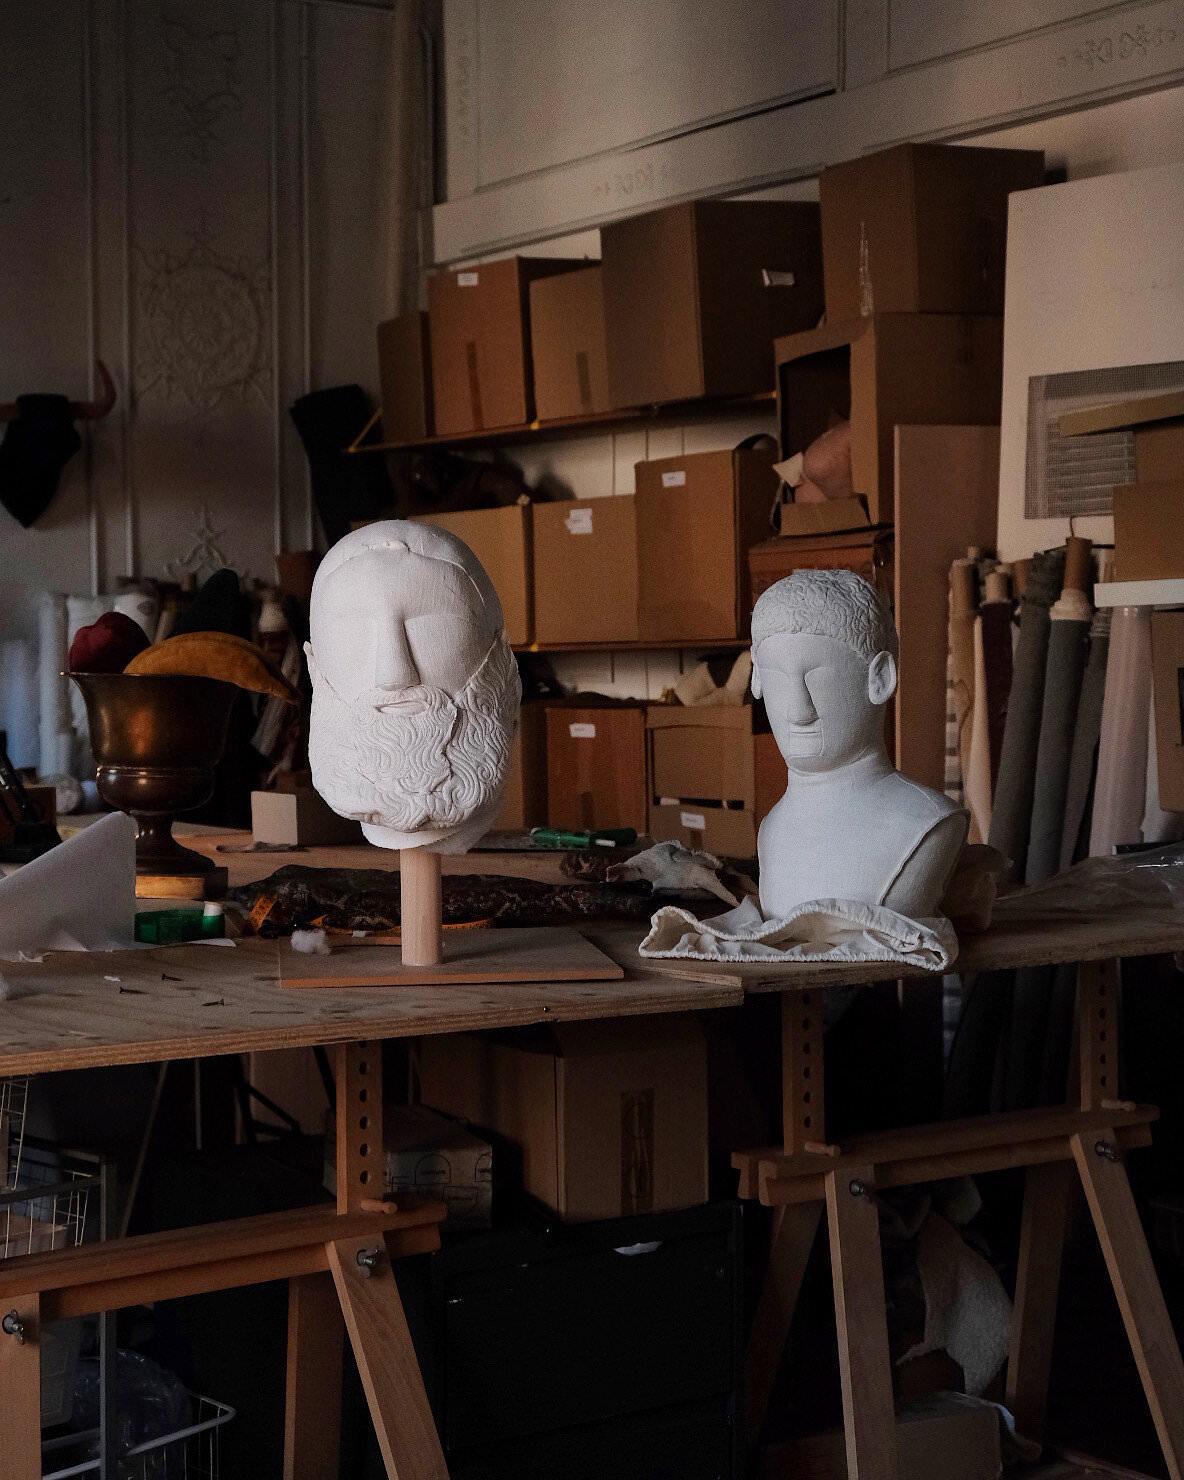 Sergio-Roger-Textile-Ruins-Soft-Sculpture-living-corriere